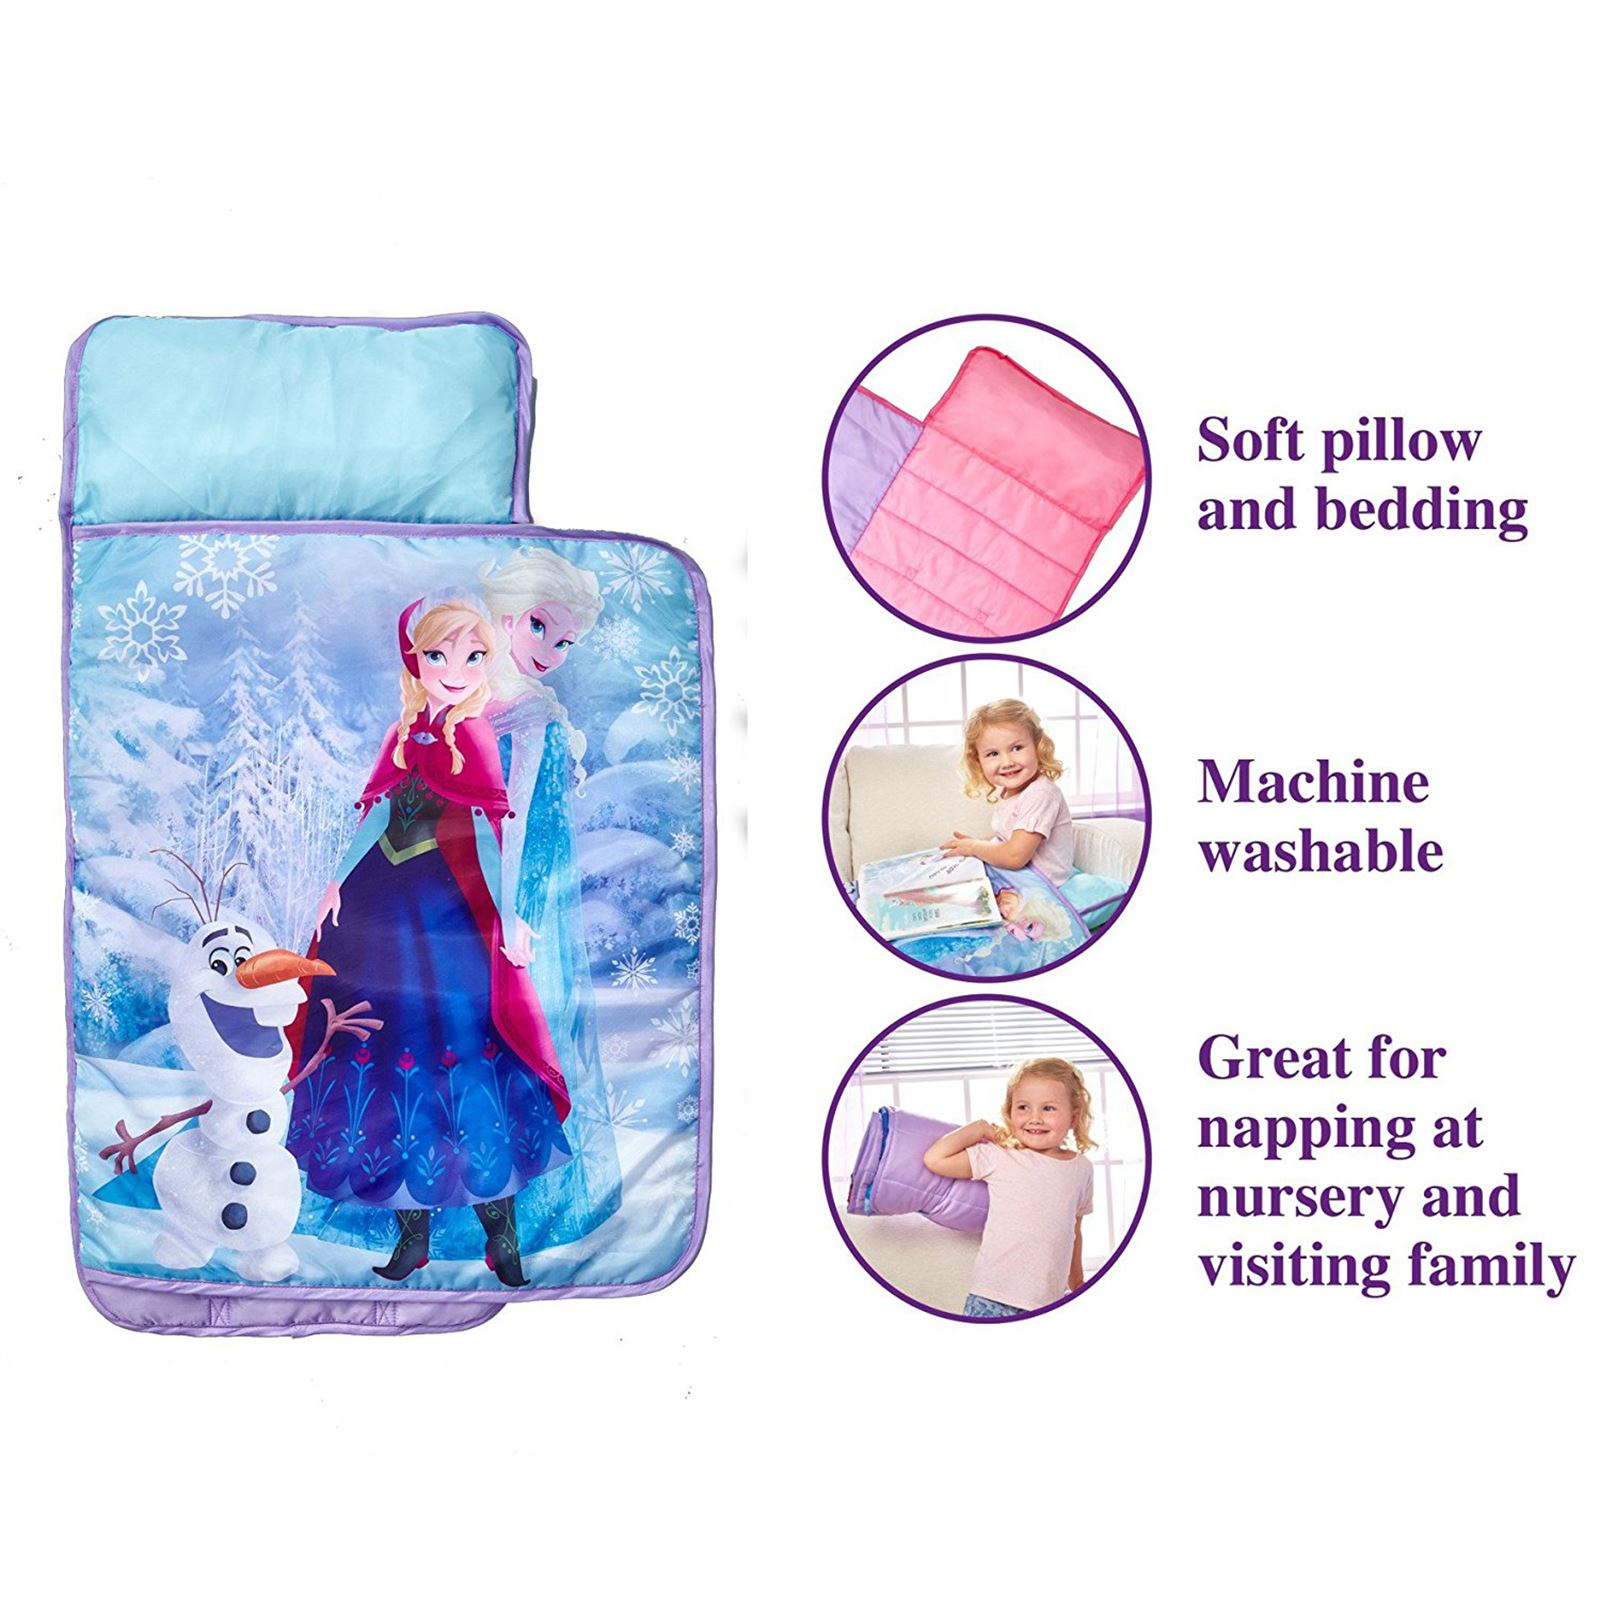 Disney Frozen Cosy Wrap Nap Bed Childrens Bedding New